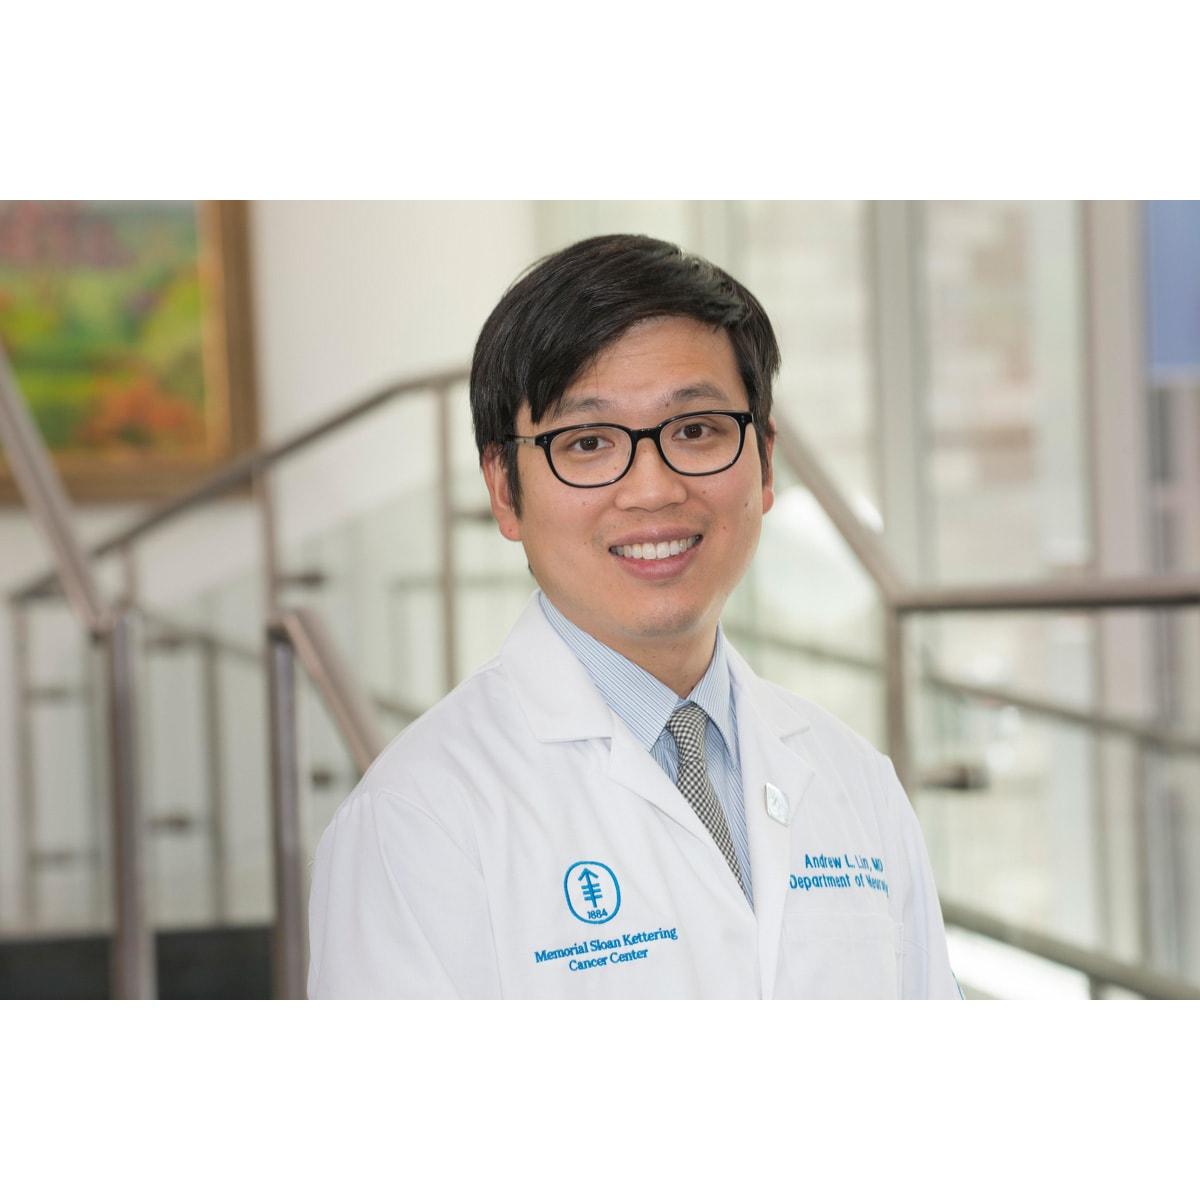 Andrew Lin, Memorial Sloan Kettering Cancer Center